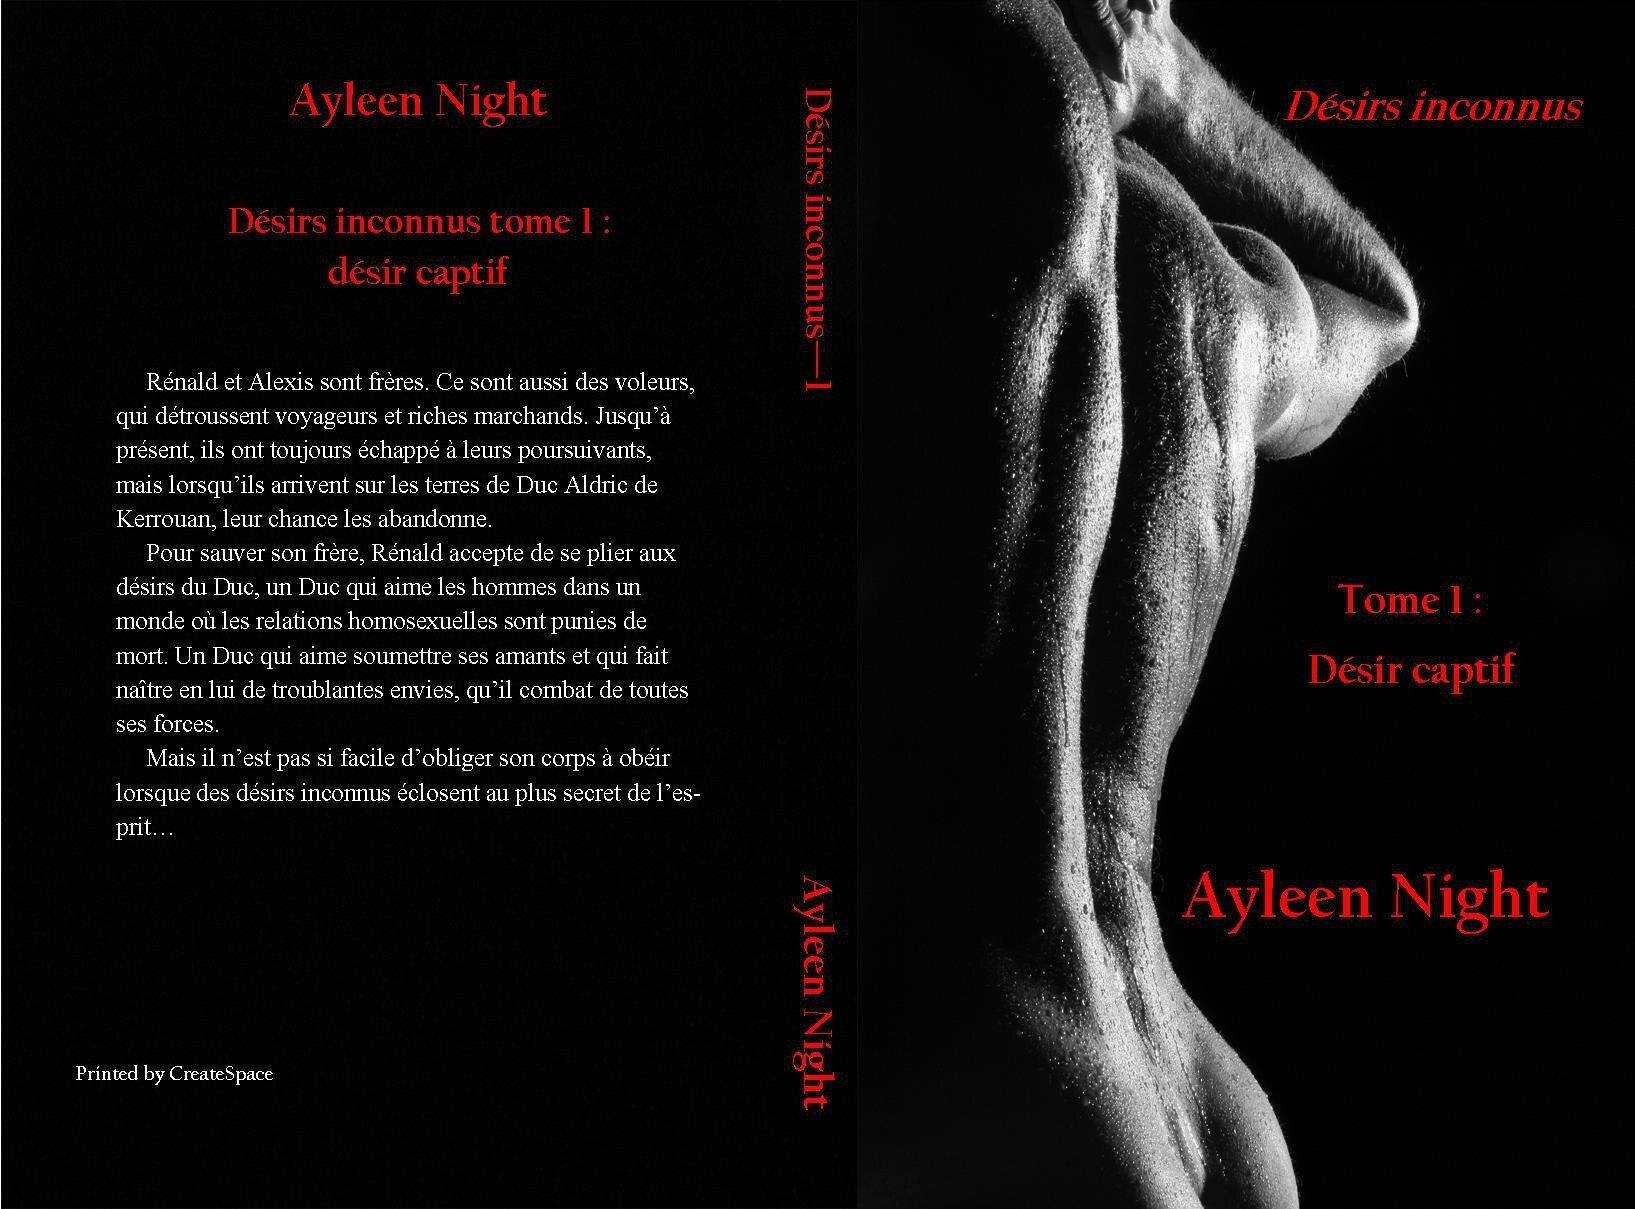 Désirs inconnus tome 1 : désir captif (Ayleen Night) : dédicace